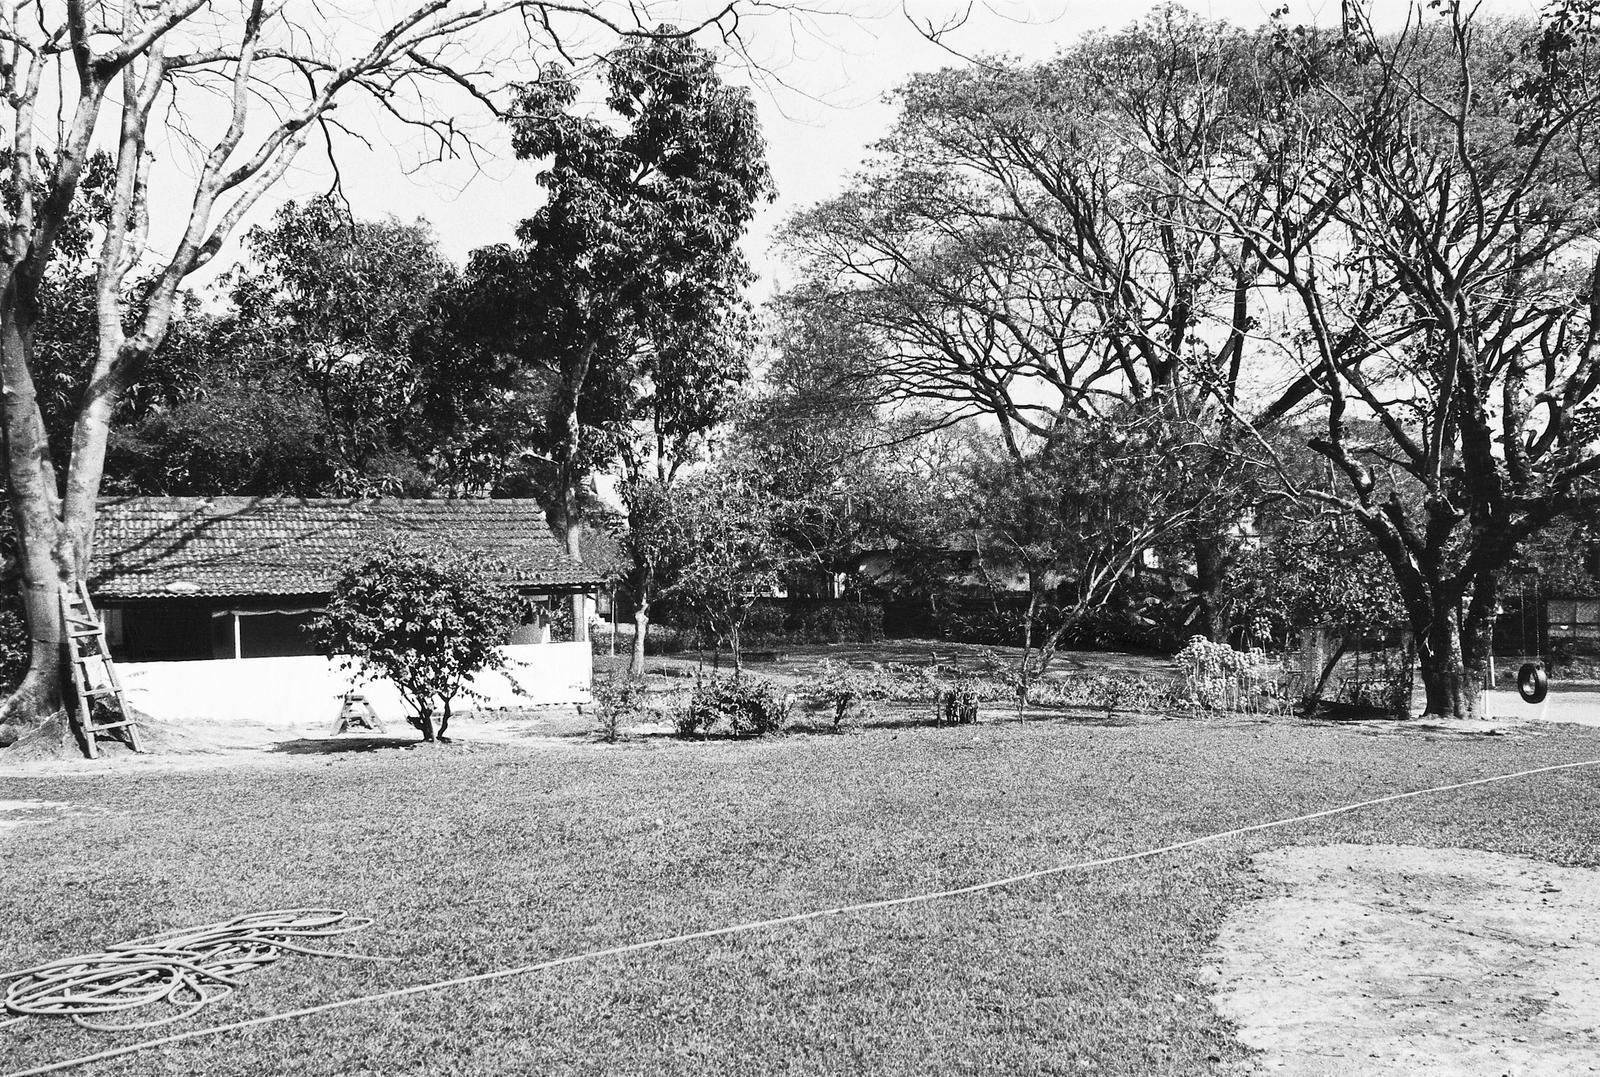 Rangoon - Standard Level Position Residence - 1981